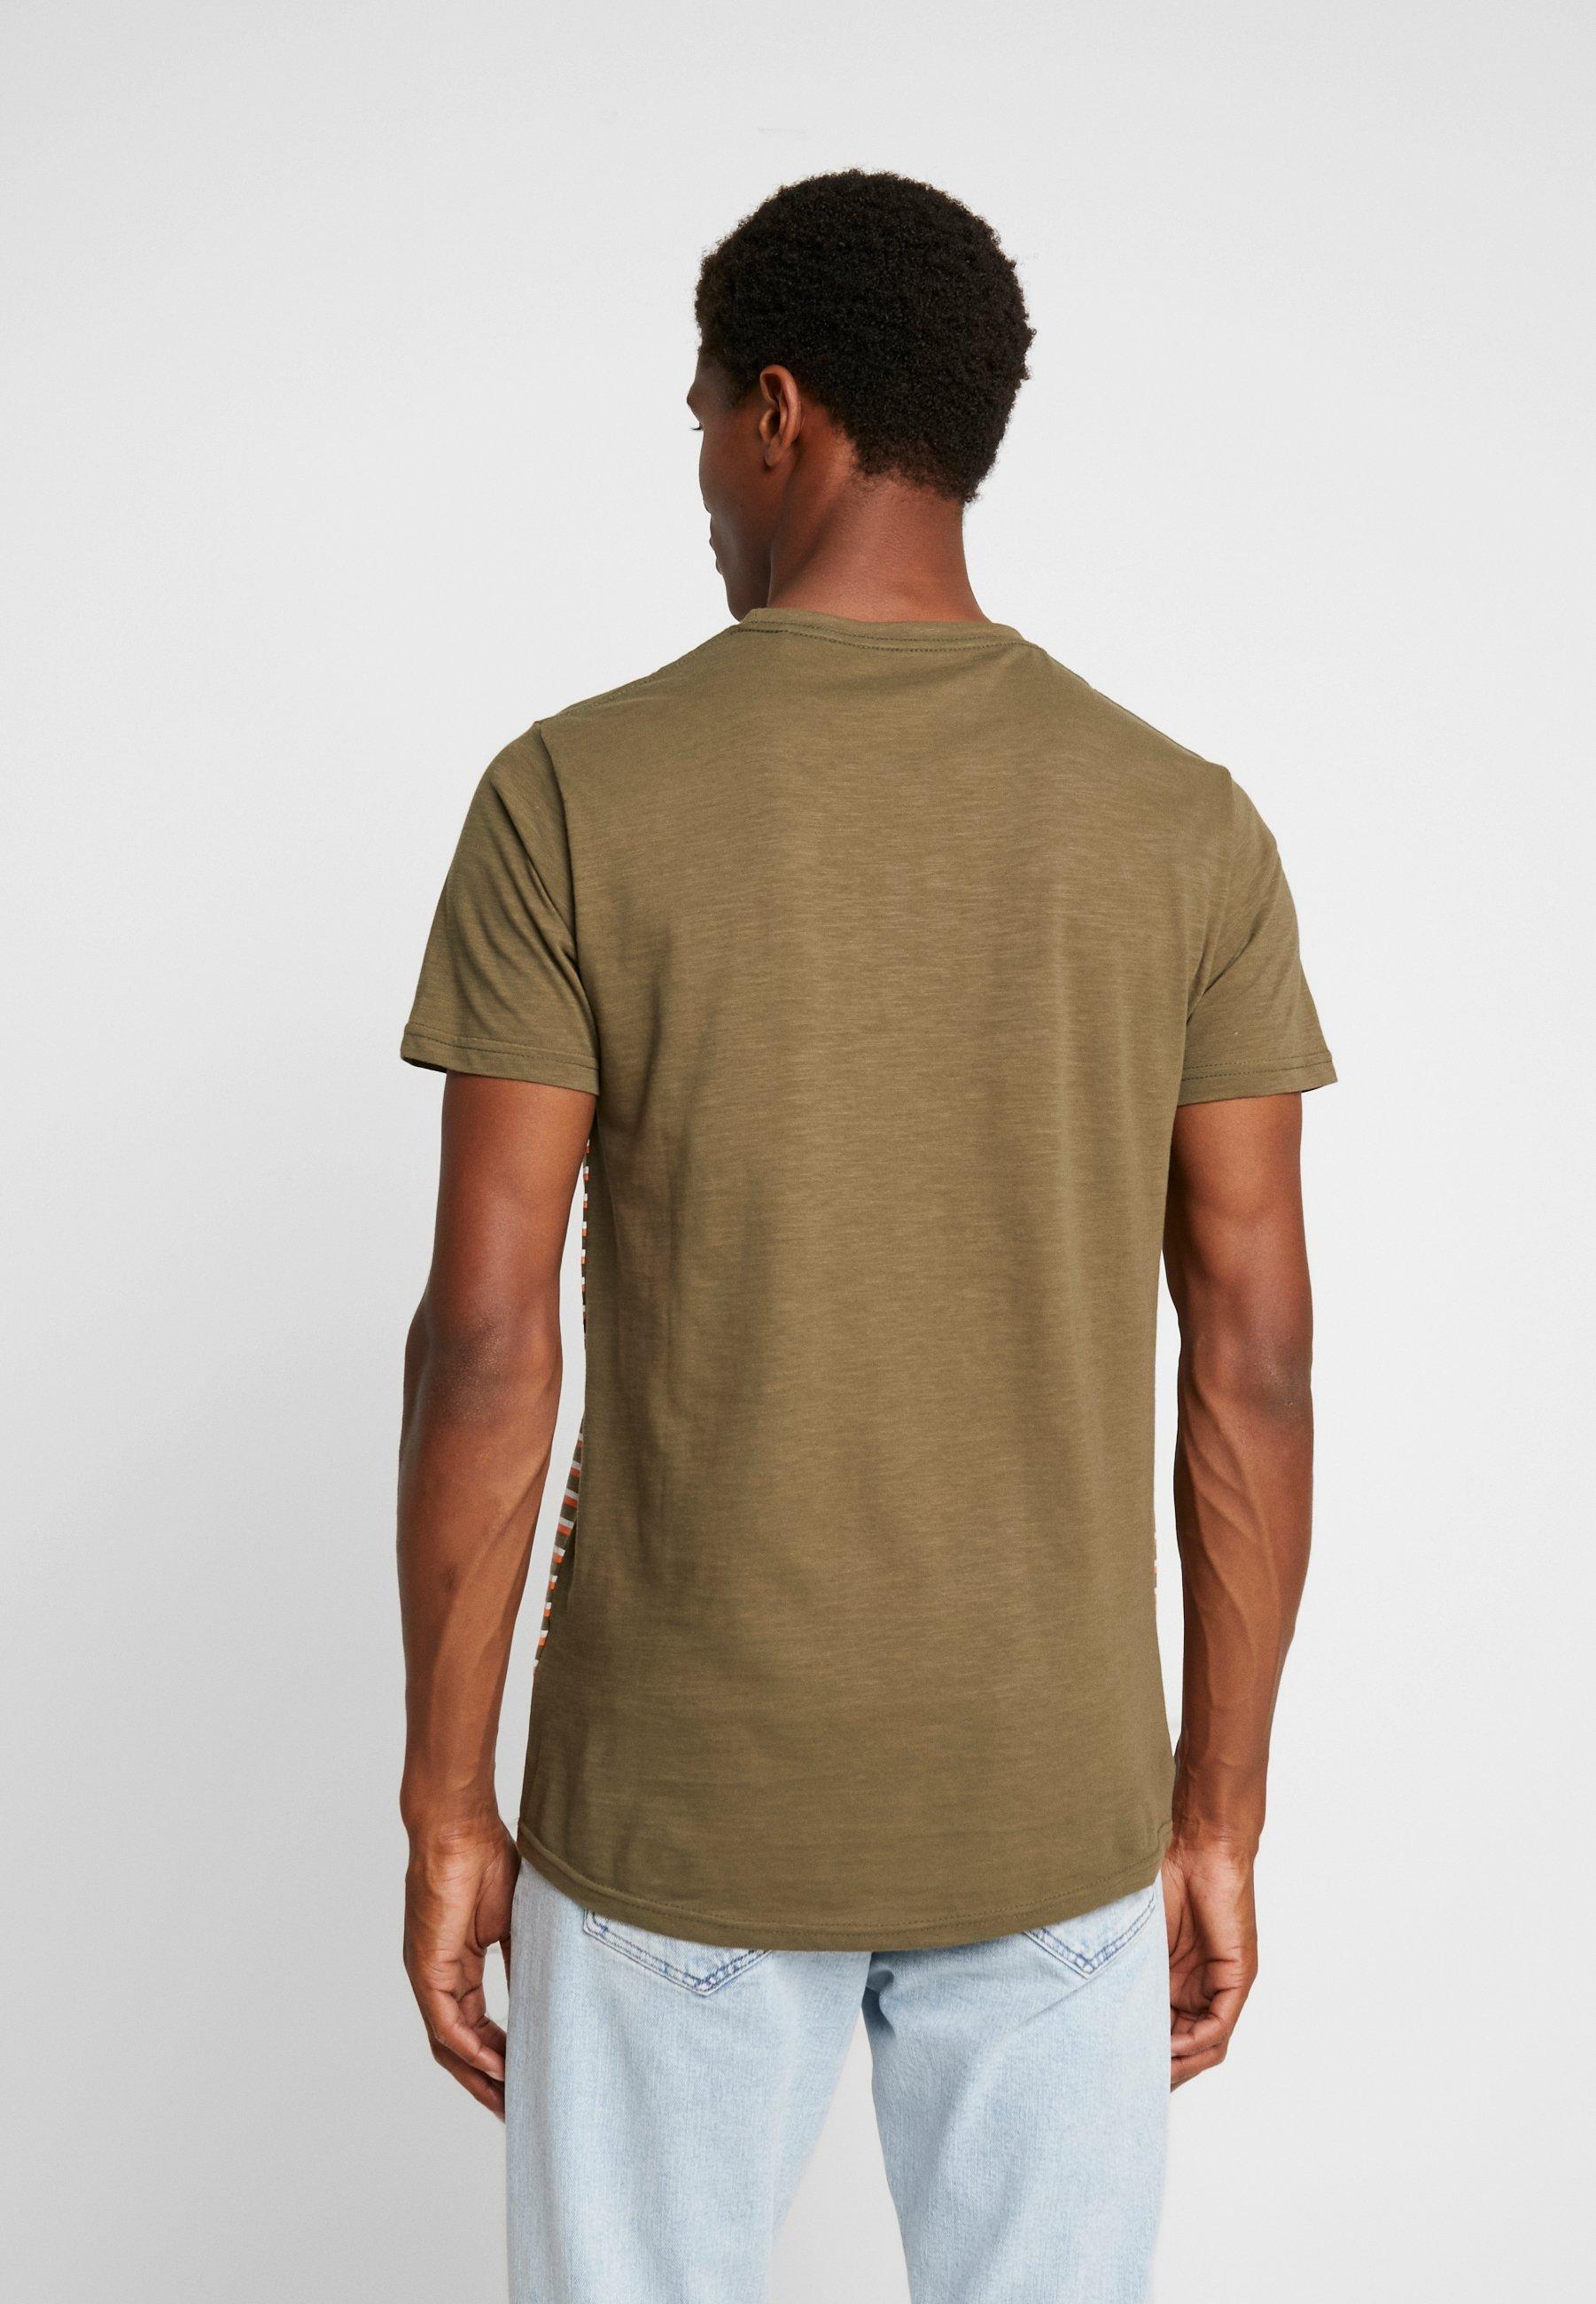 Imprimé Shine Stripe Original Army Pocket TeeT shirt OuTPkZiwXl